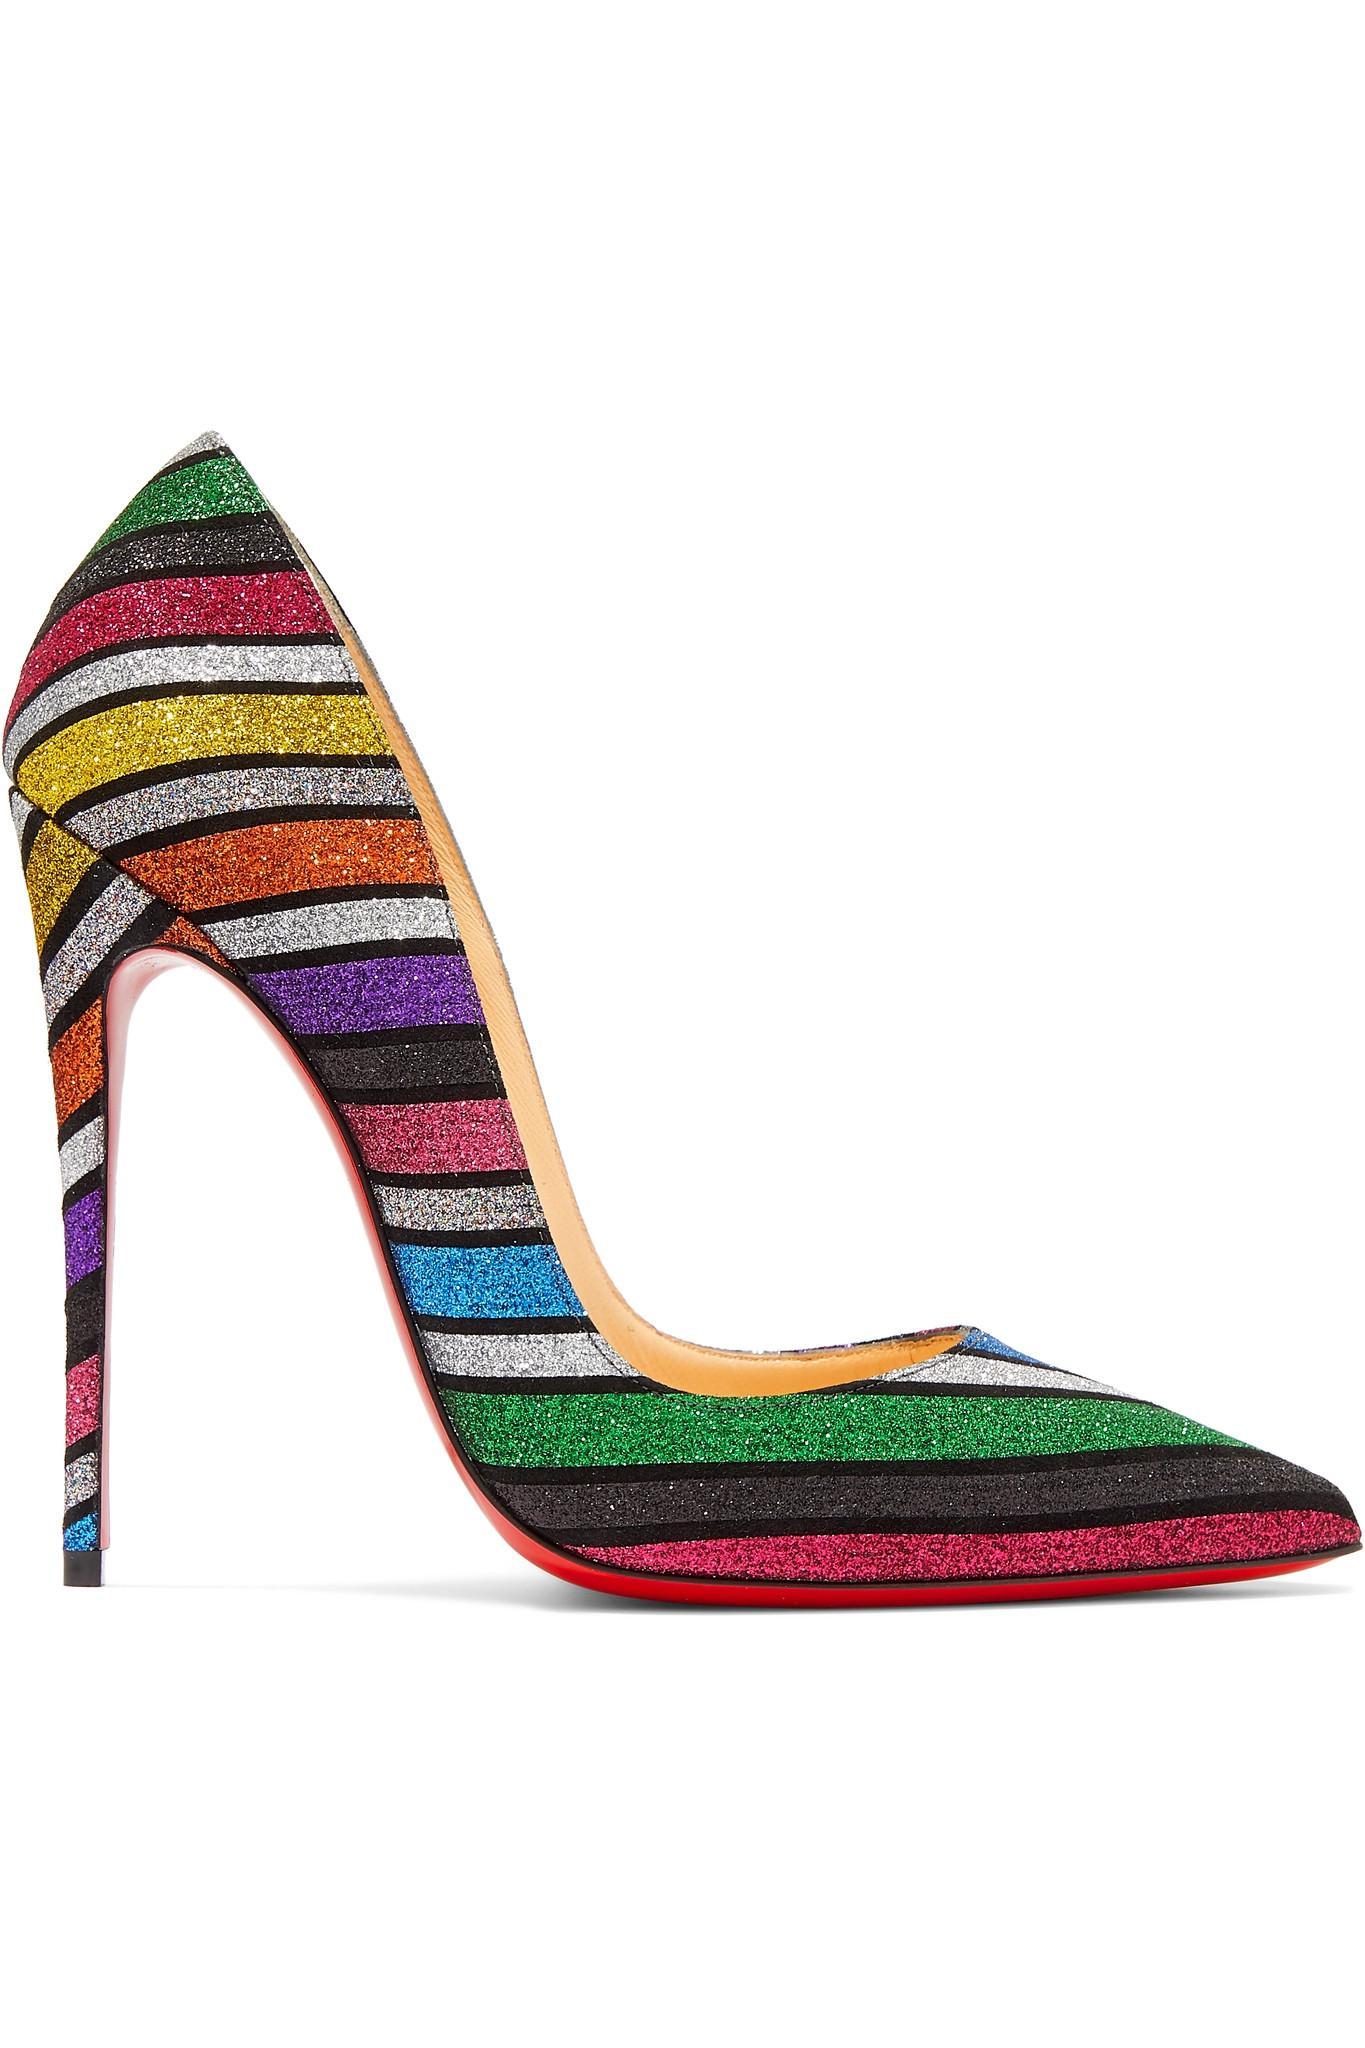 650bf0e6aa Christian Louboutin. Women's Metallic So Kate 120 Striped Glittered Suede  Pumps